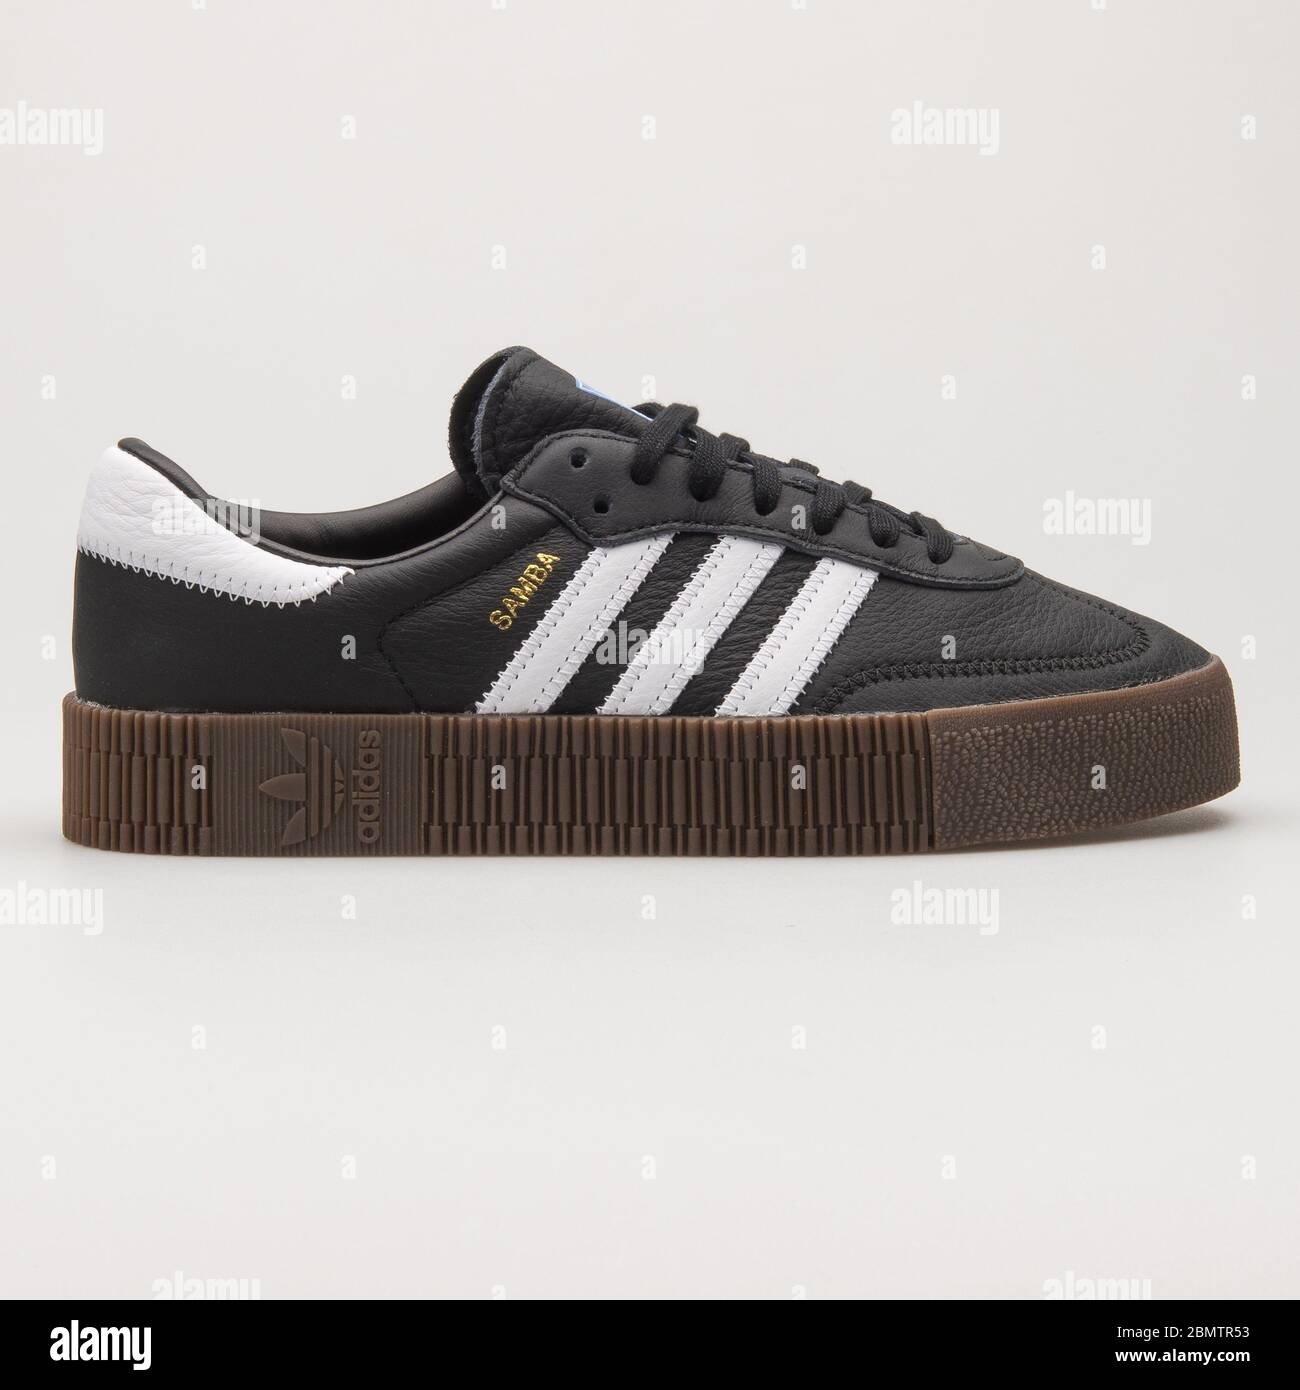 2018: Adidas Sambarose black